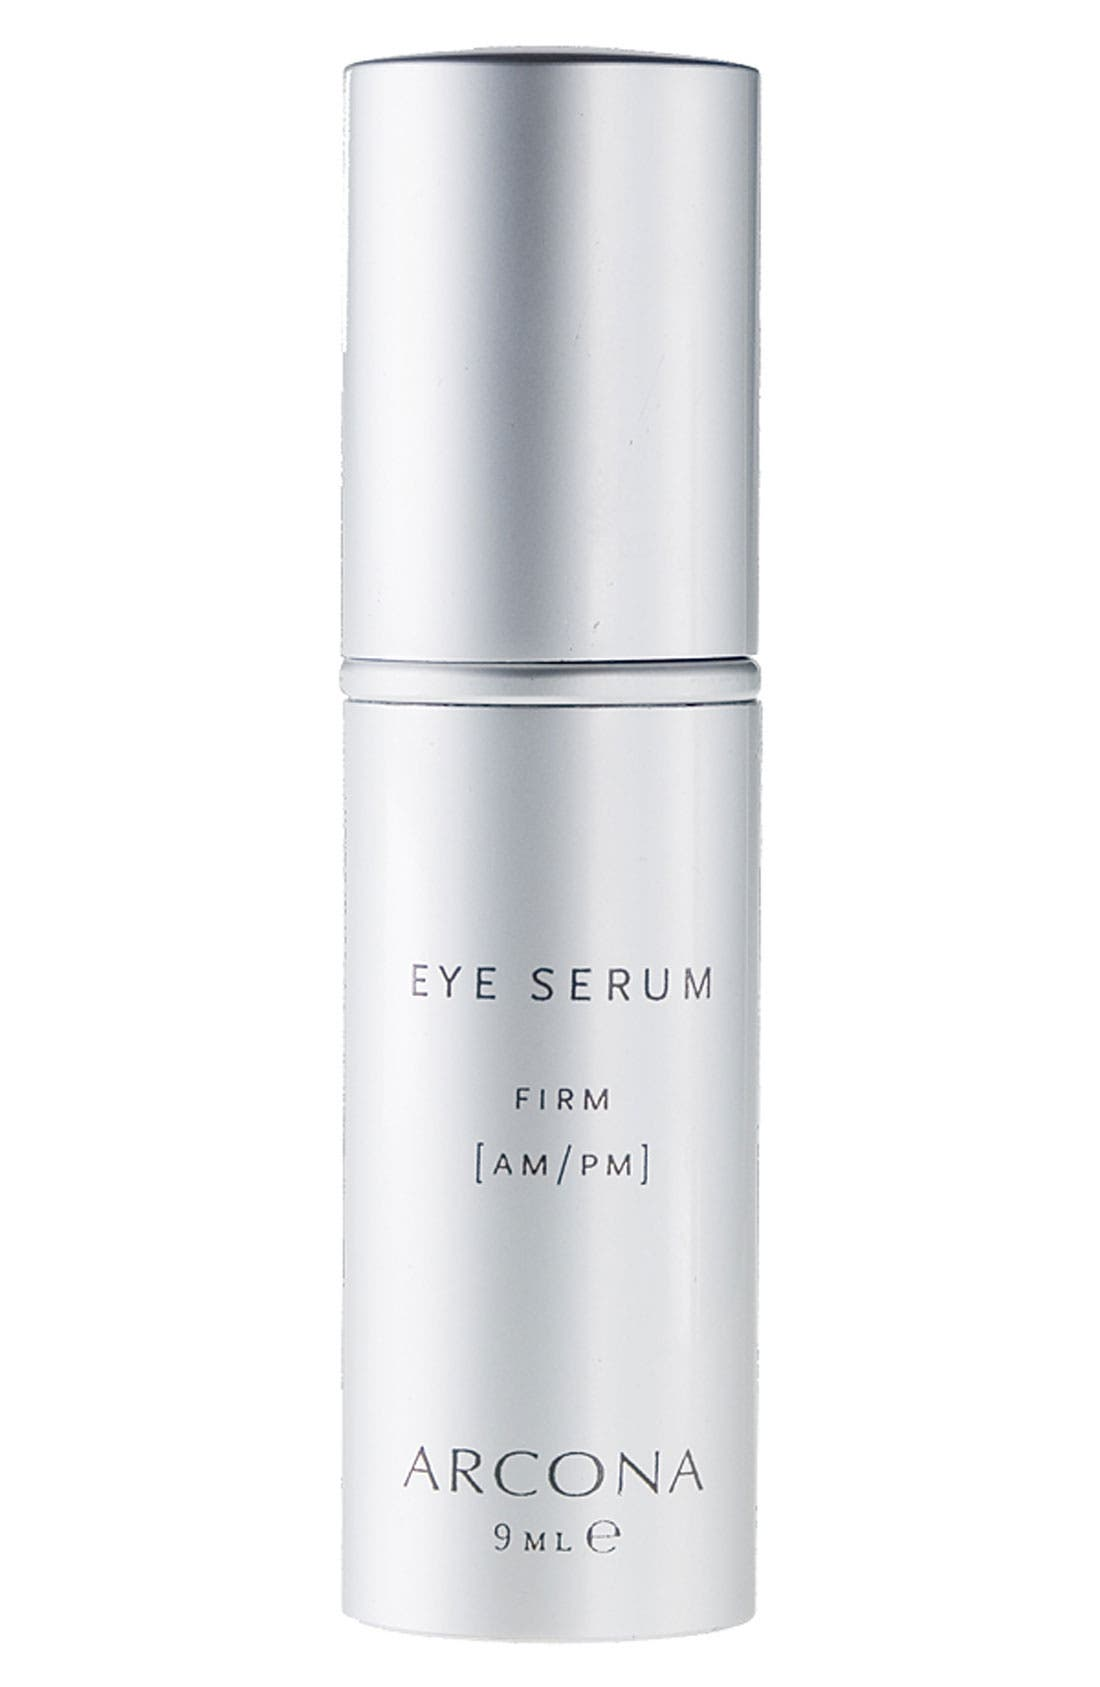 ARCONA Eye Serum